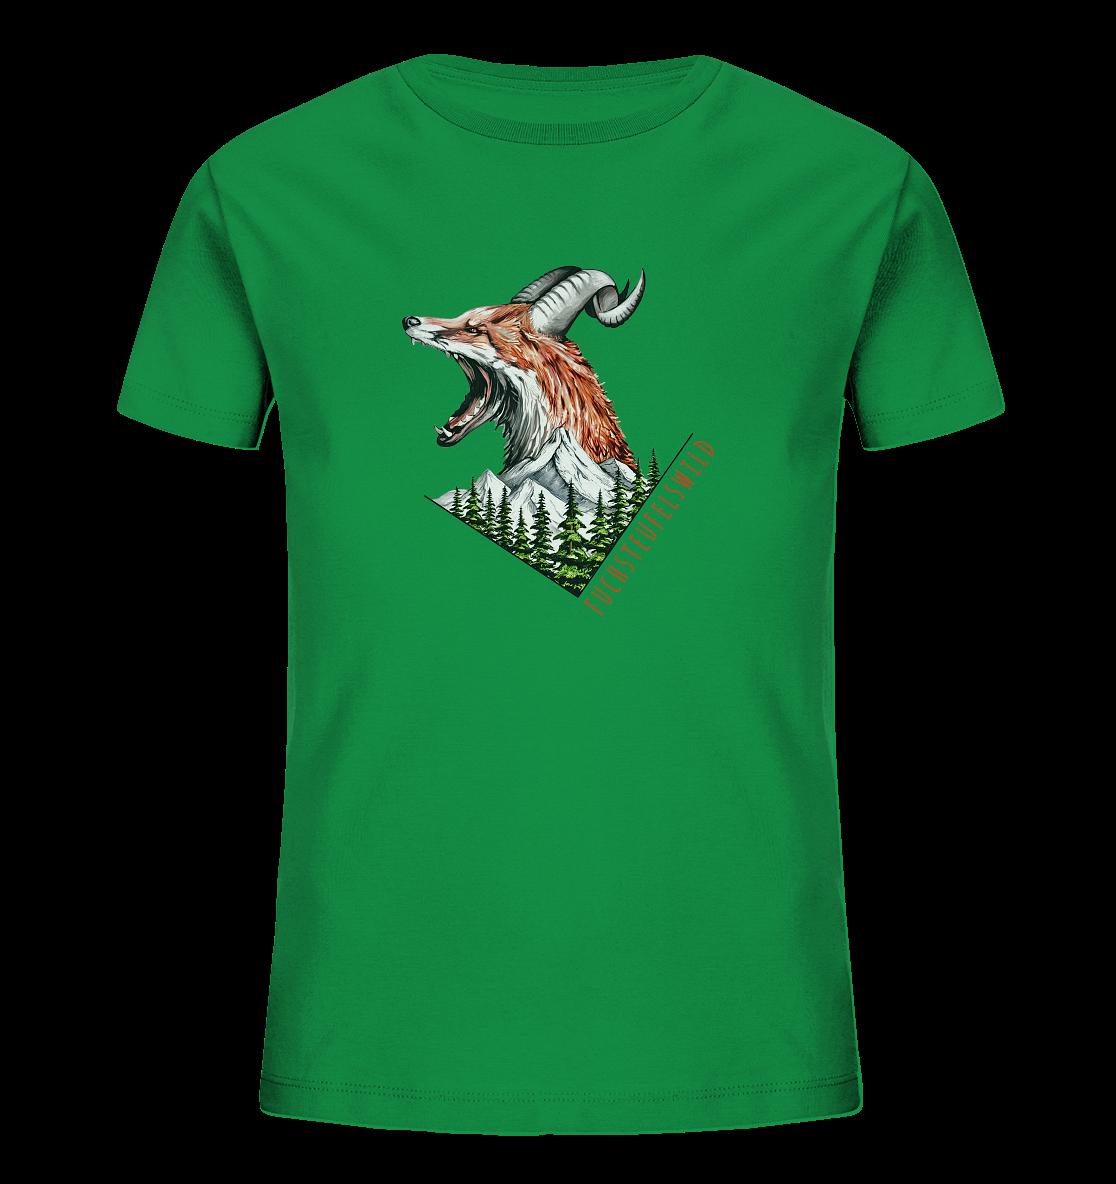 front-kids-organic-shirt-149348-1116x-1.png